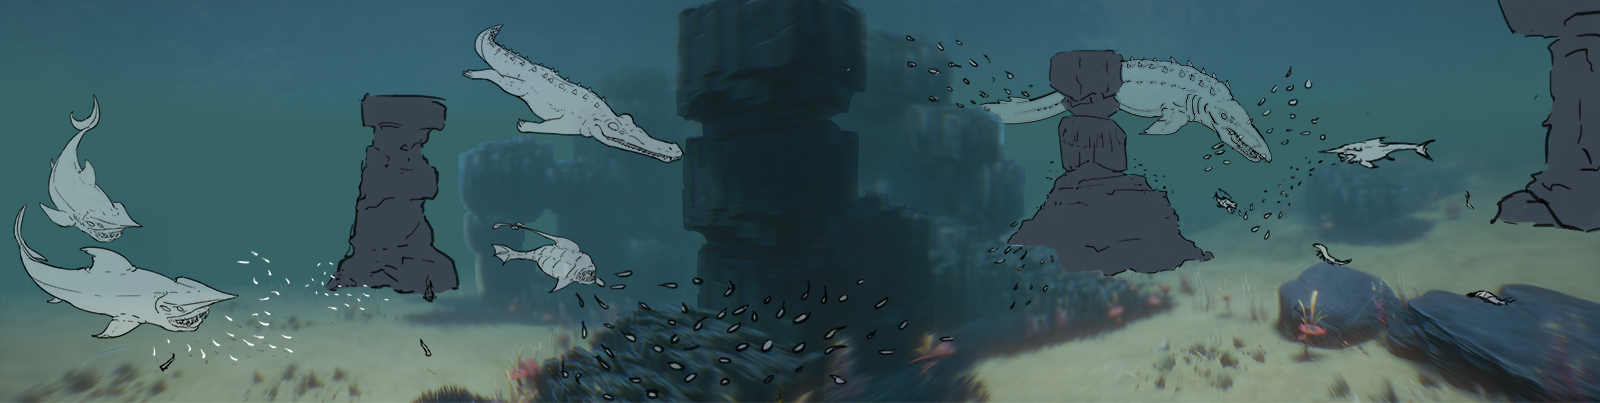 UnderwaterBiome_0010